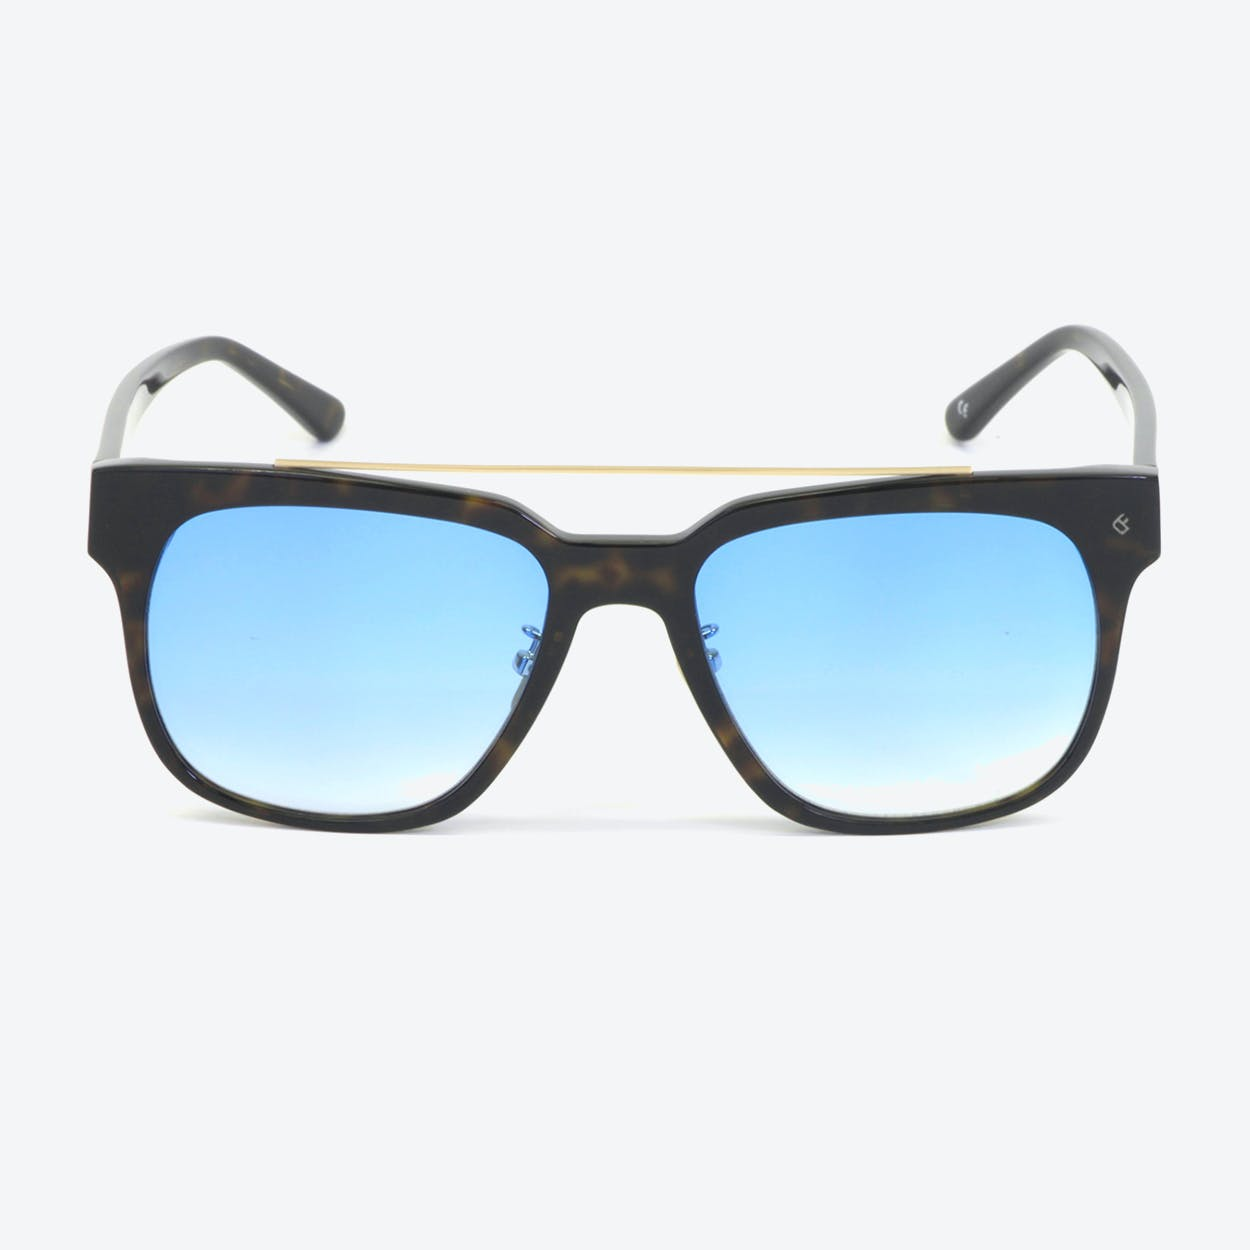 Sunglasses Sonder C01